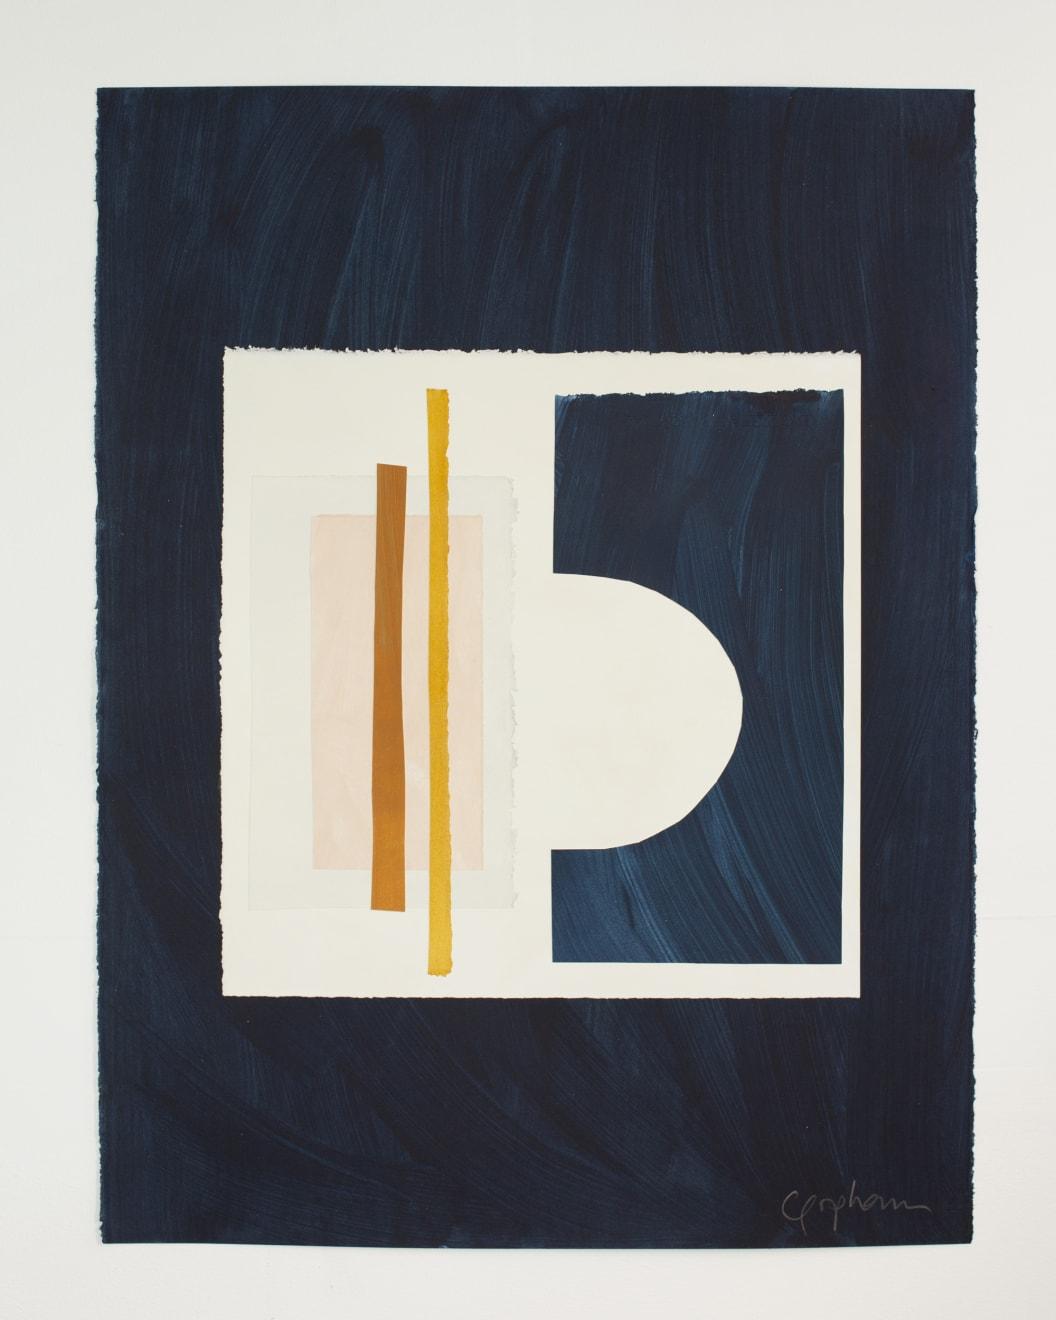 Caroline Popham, Sky Arcs & Lines, 2020